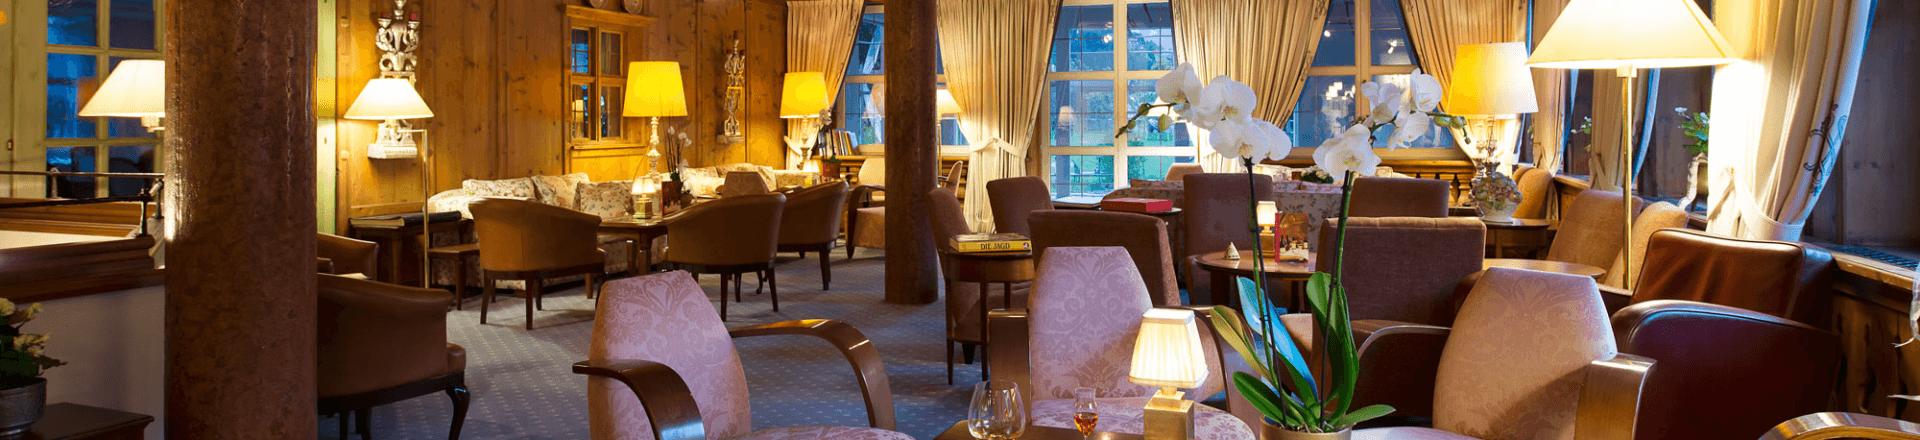 Lounge im Verwöhnhotel Theresa